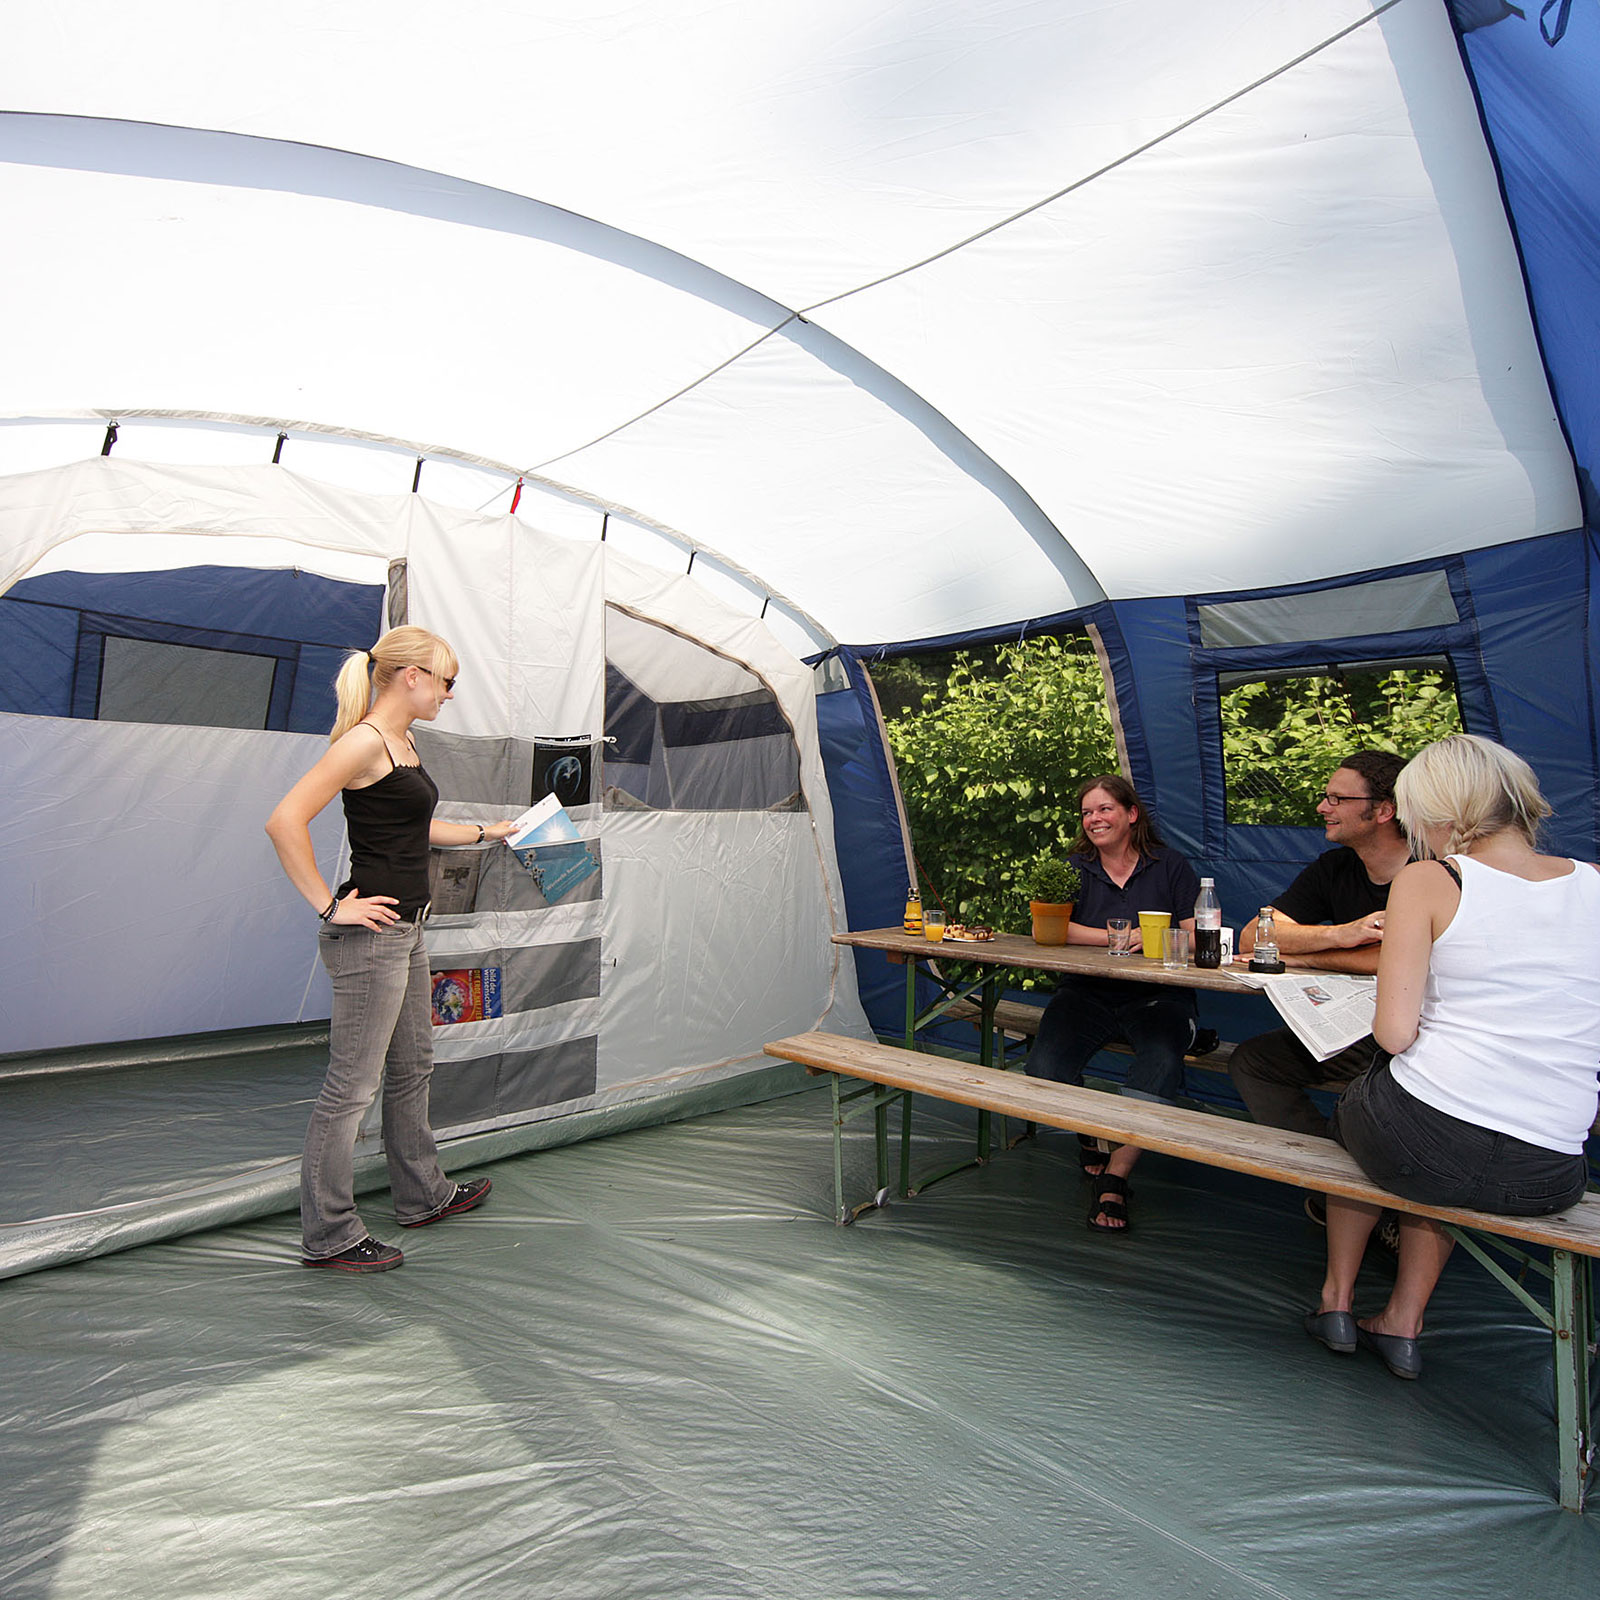 skandika milano 6 pers tente camping familiale 580x410. Black Bedroom Furniture Sets. Home Design Ideas